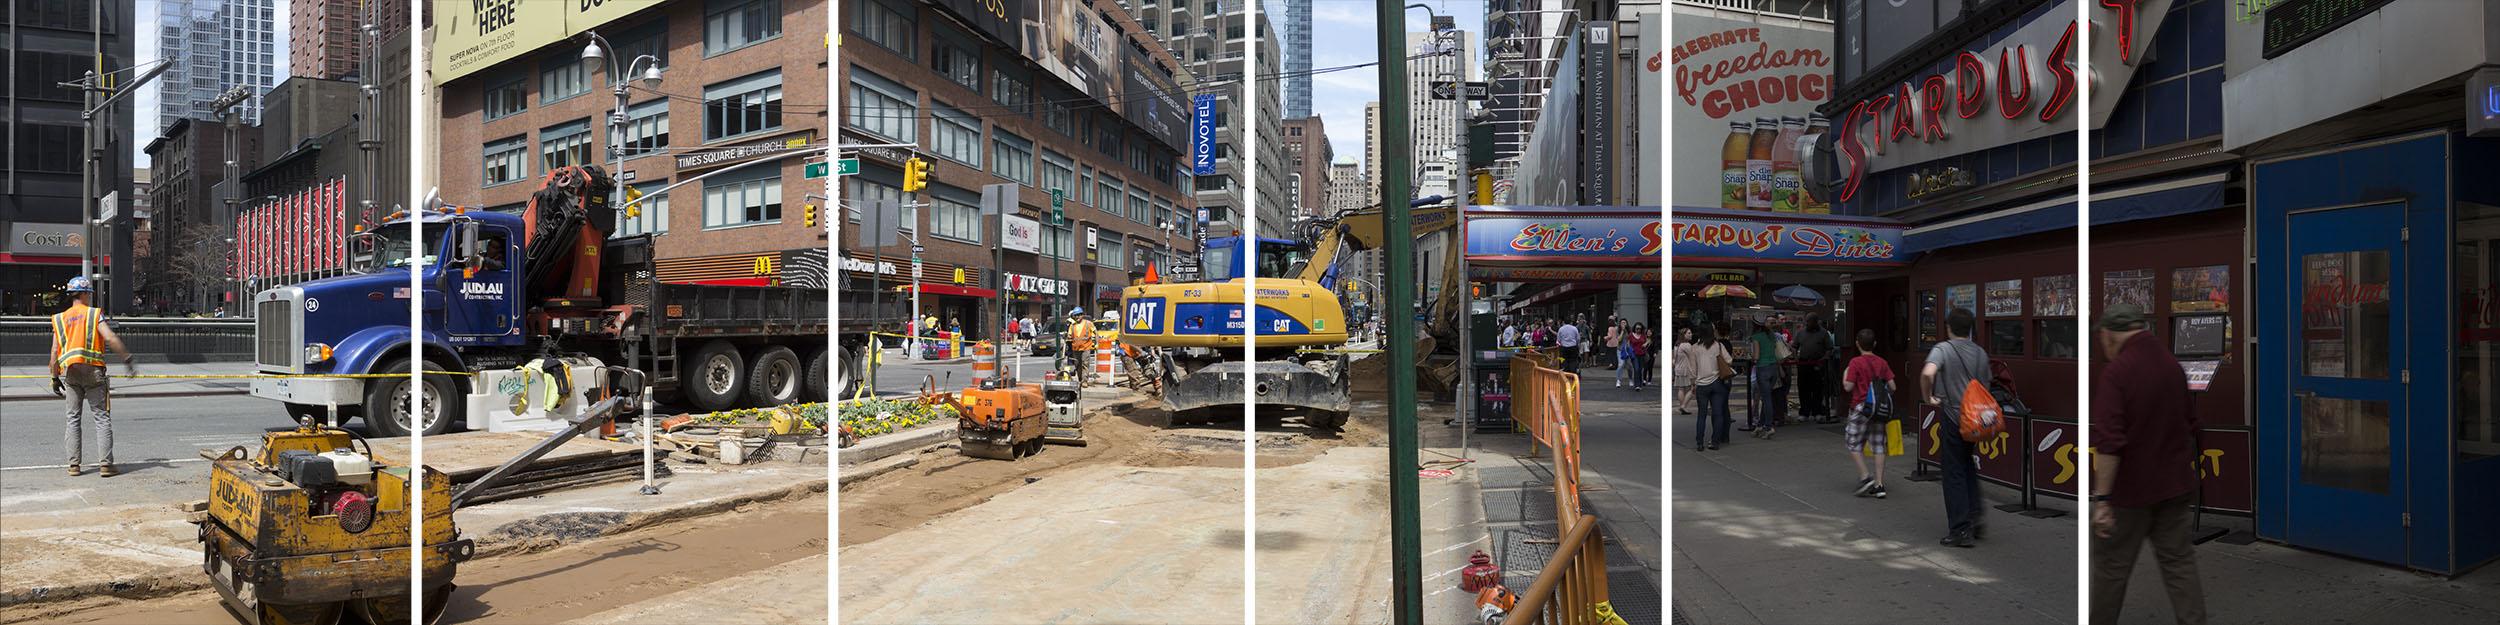 New York, Manhattan,14-18-2014,5901-5911